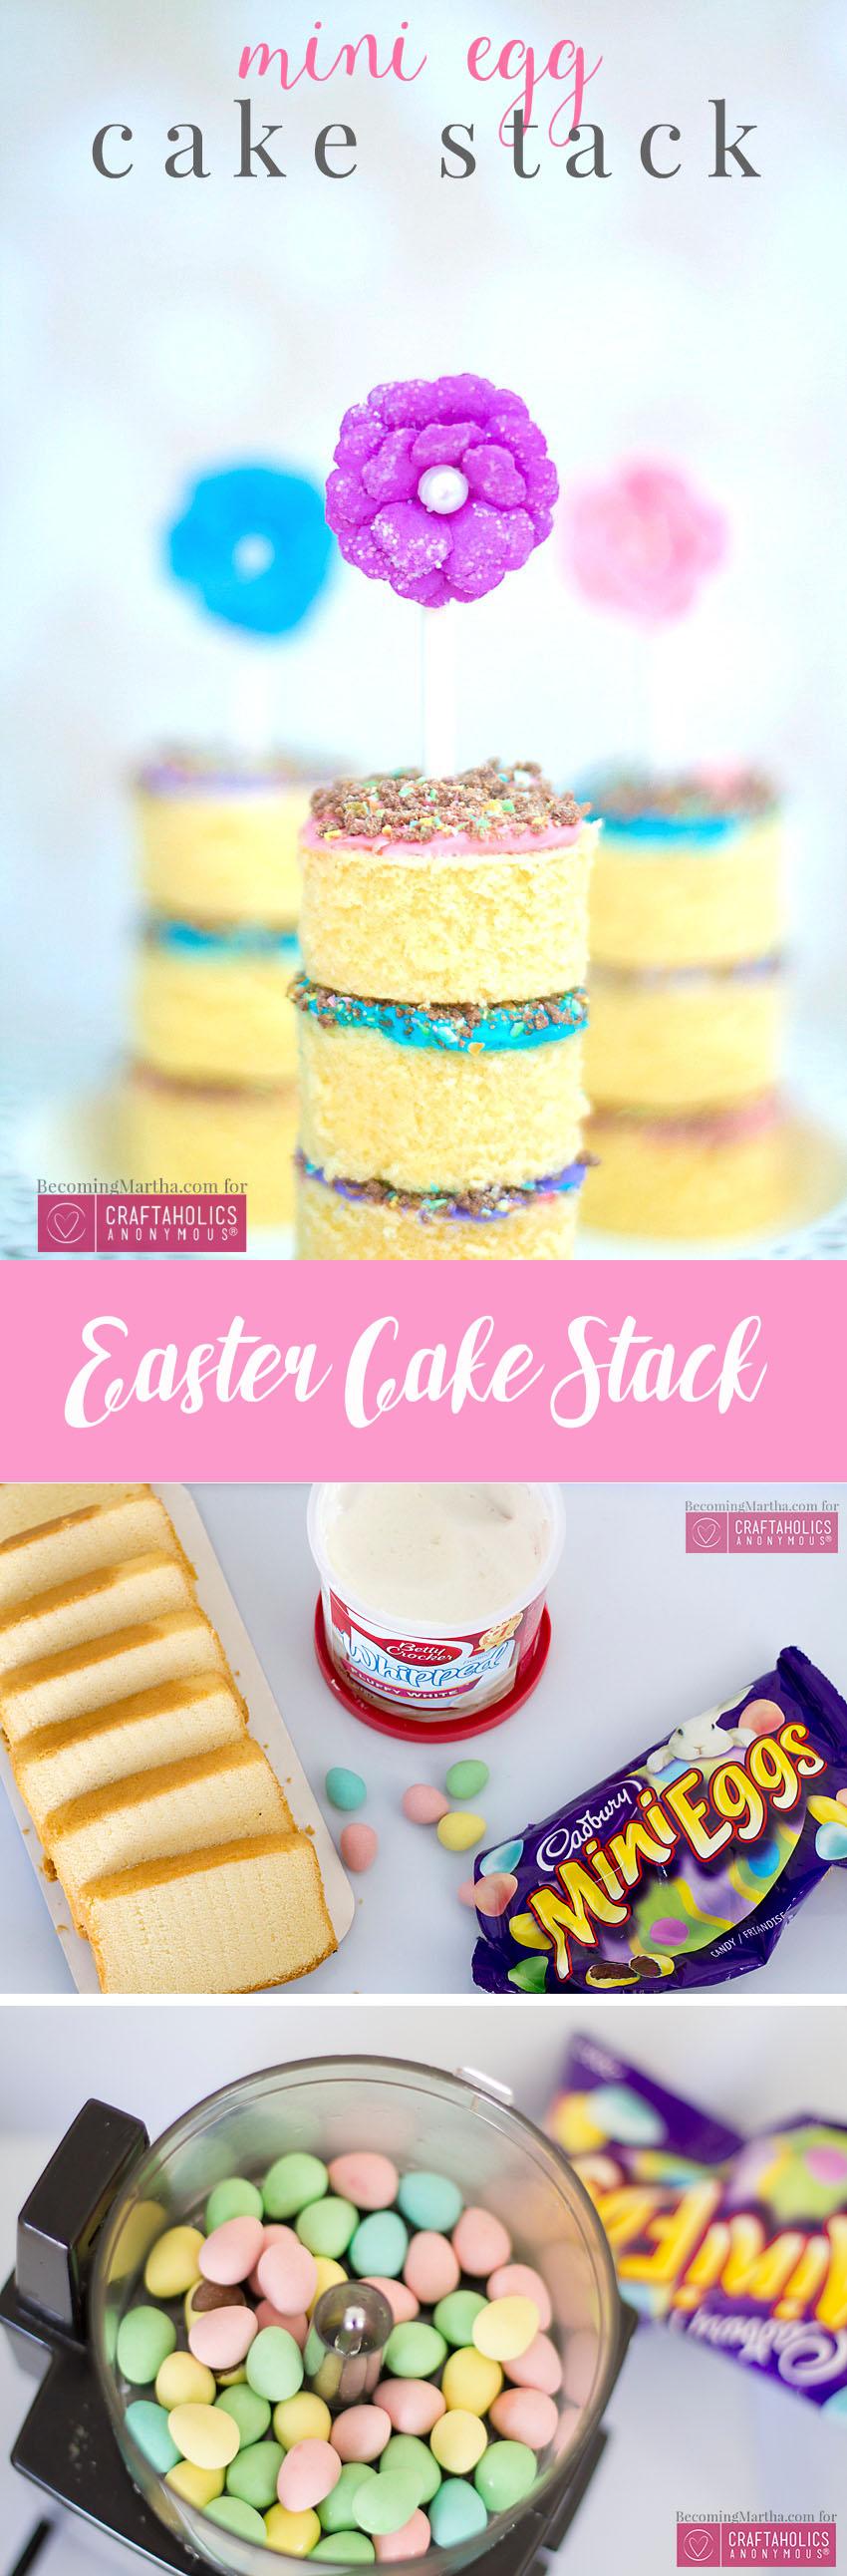 Easter Cake Stack. Cute and YUMMY Easter treat idea using Mini Cadbury Eggs!